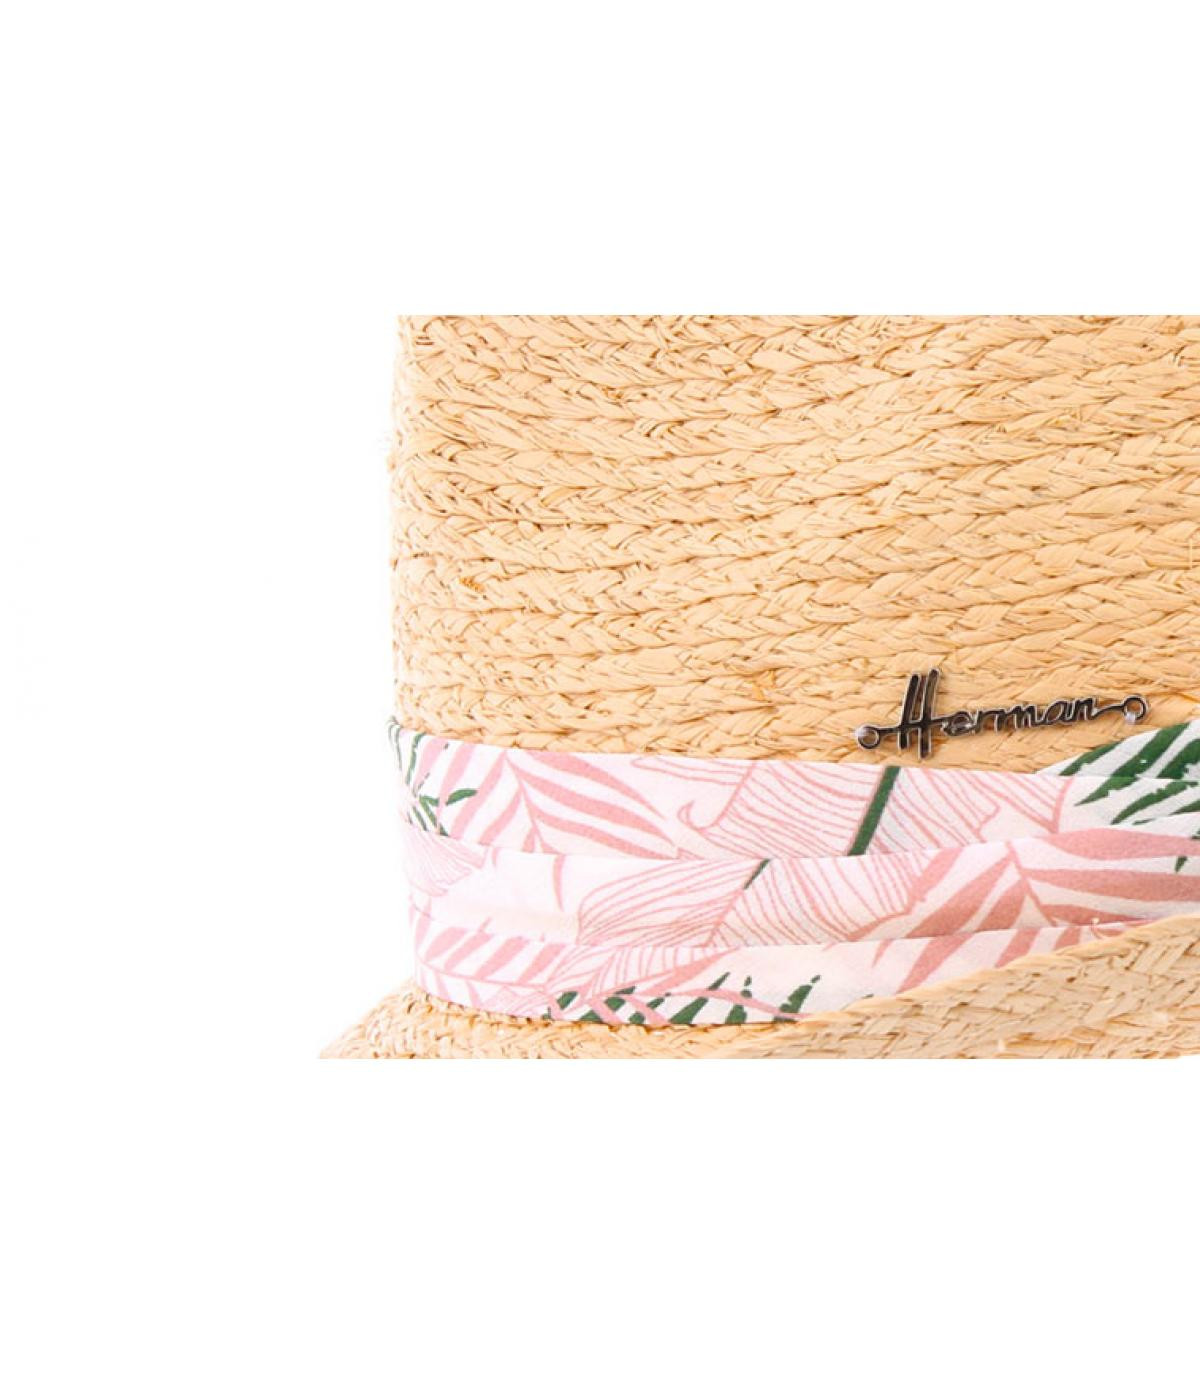 Dettagli Don Sato pink wmn - image 3